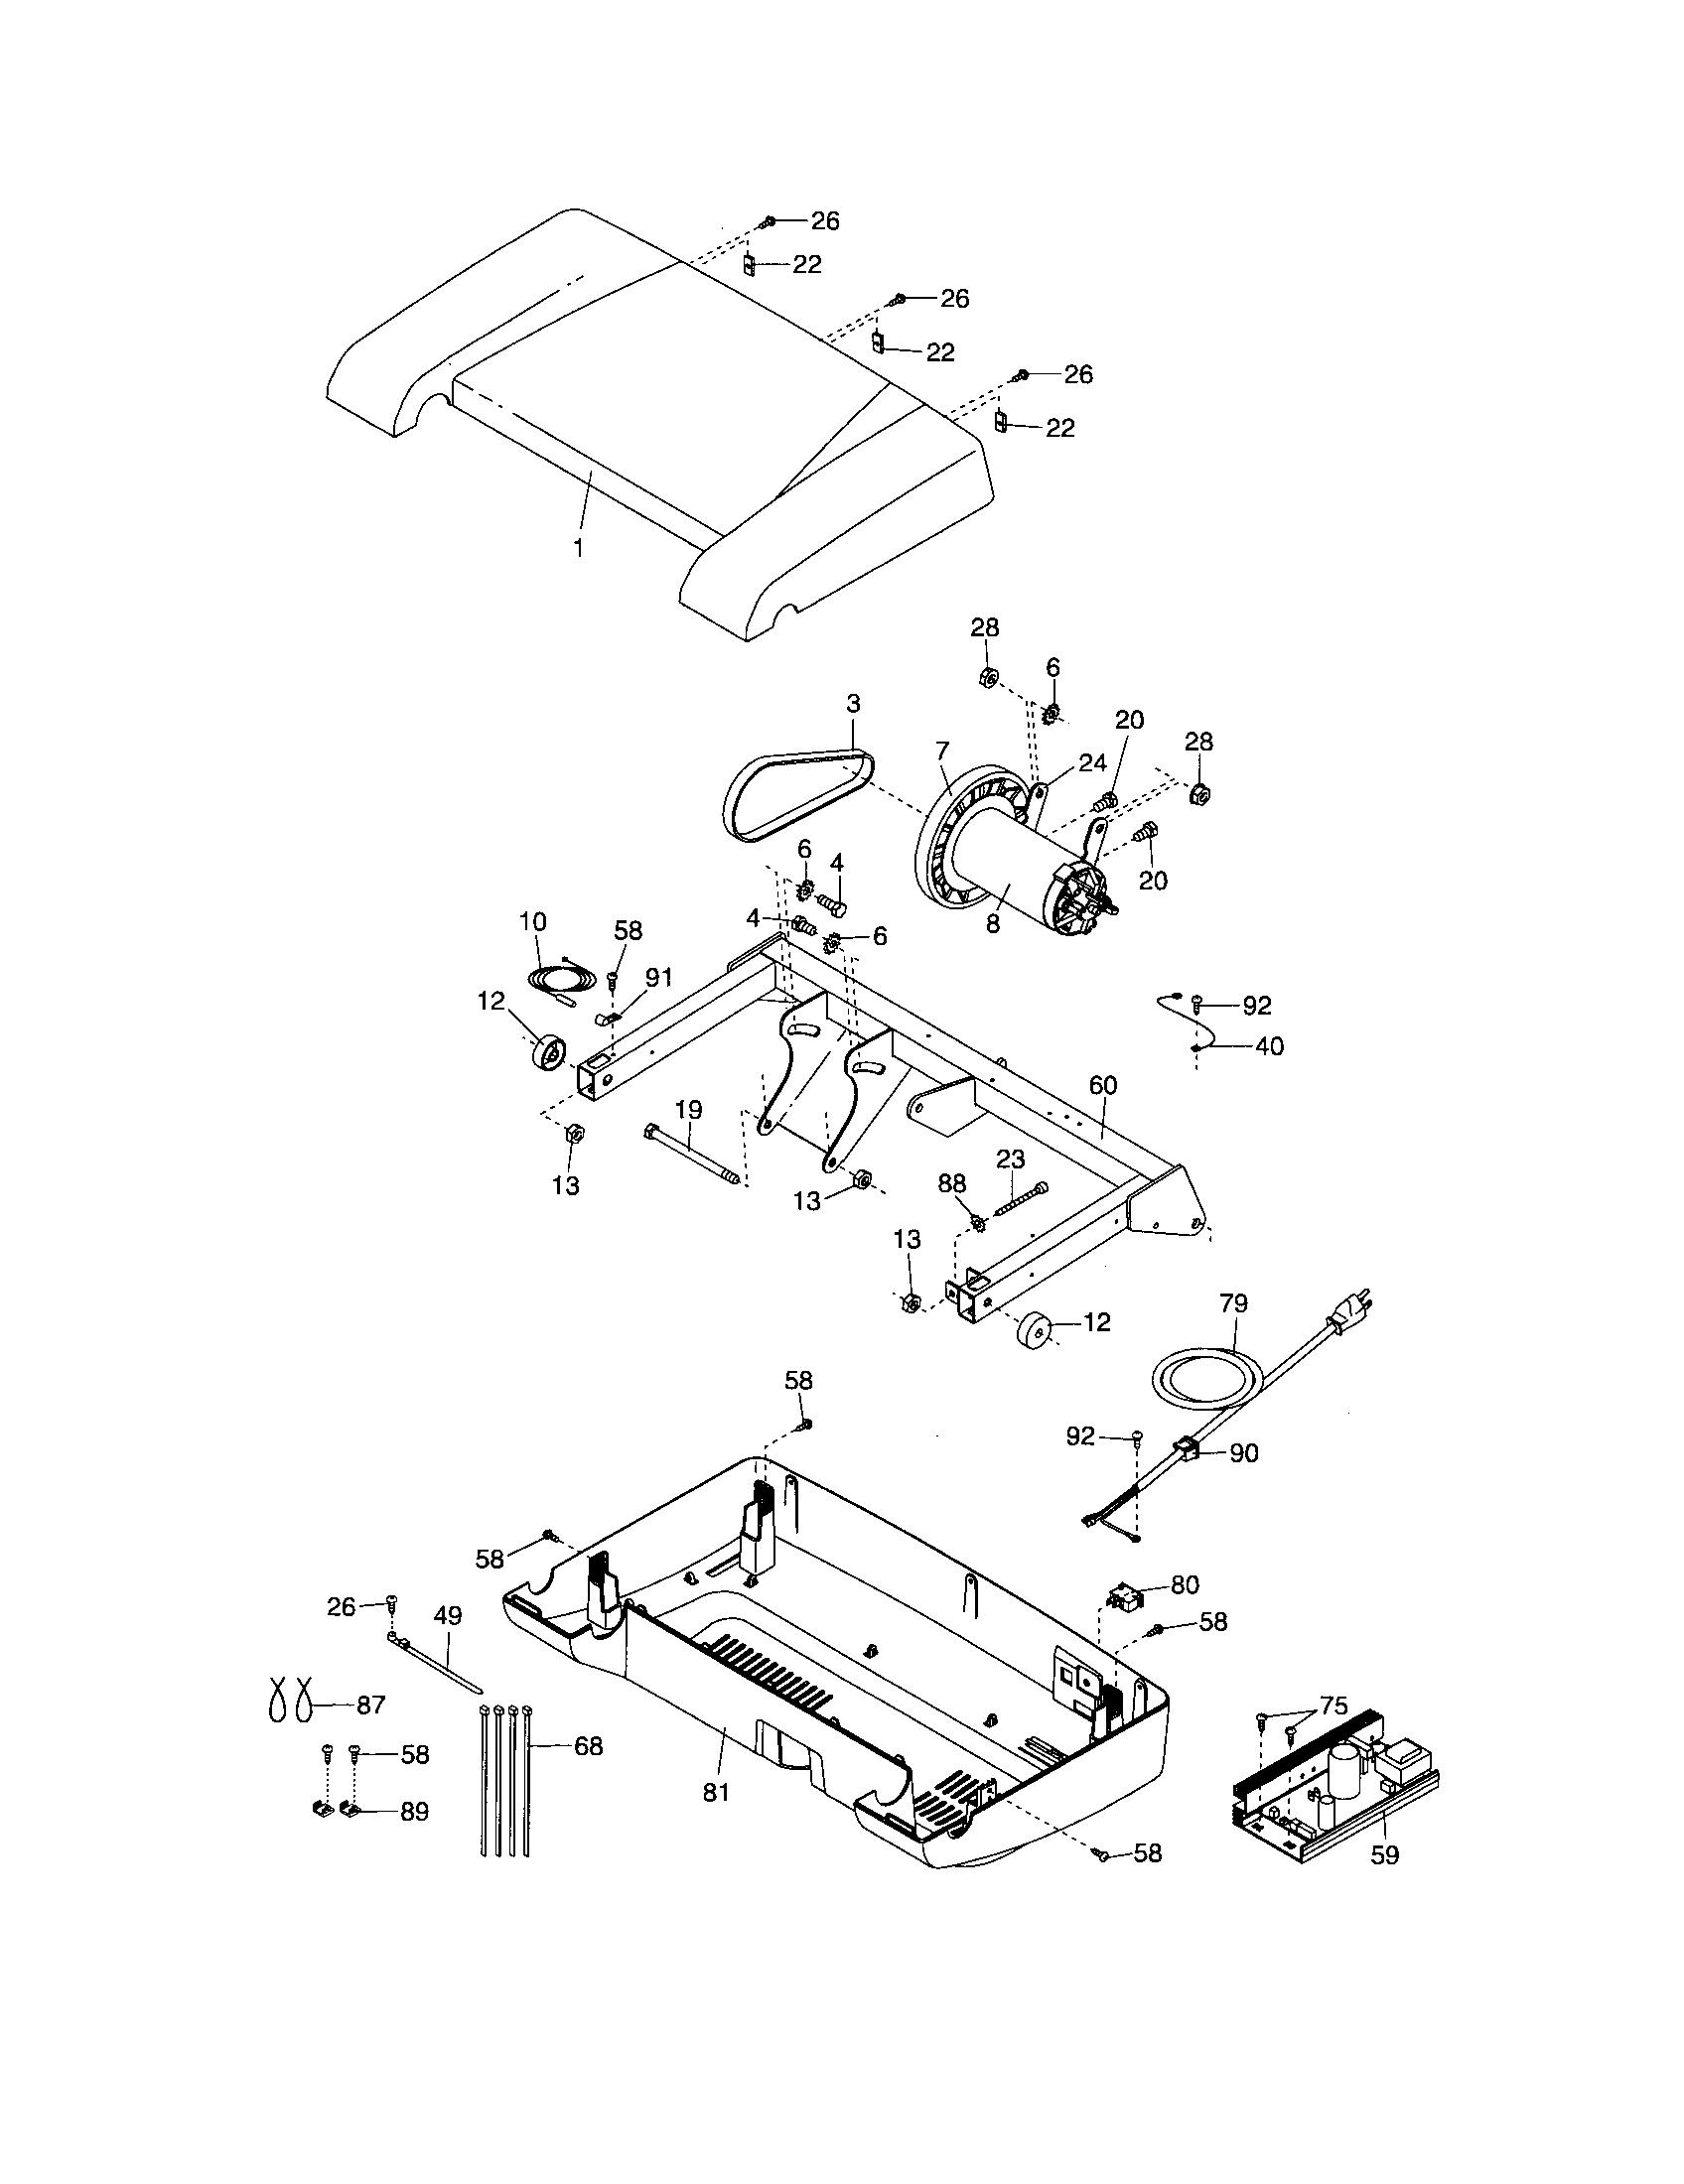 Proform model 831246330 treadmill genuine parts